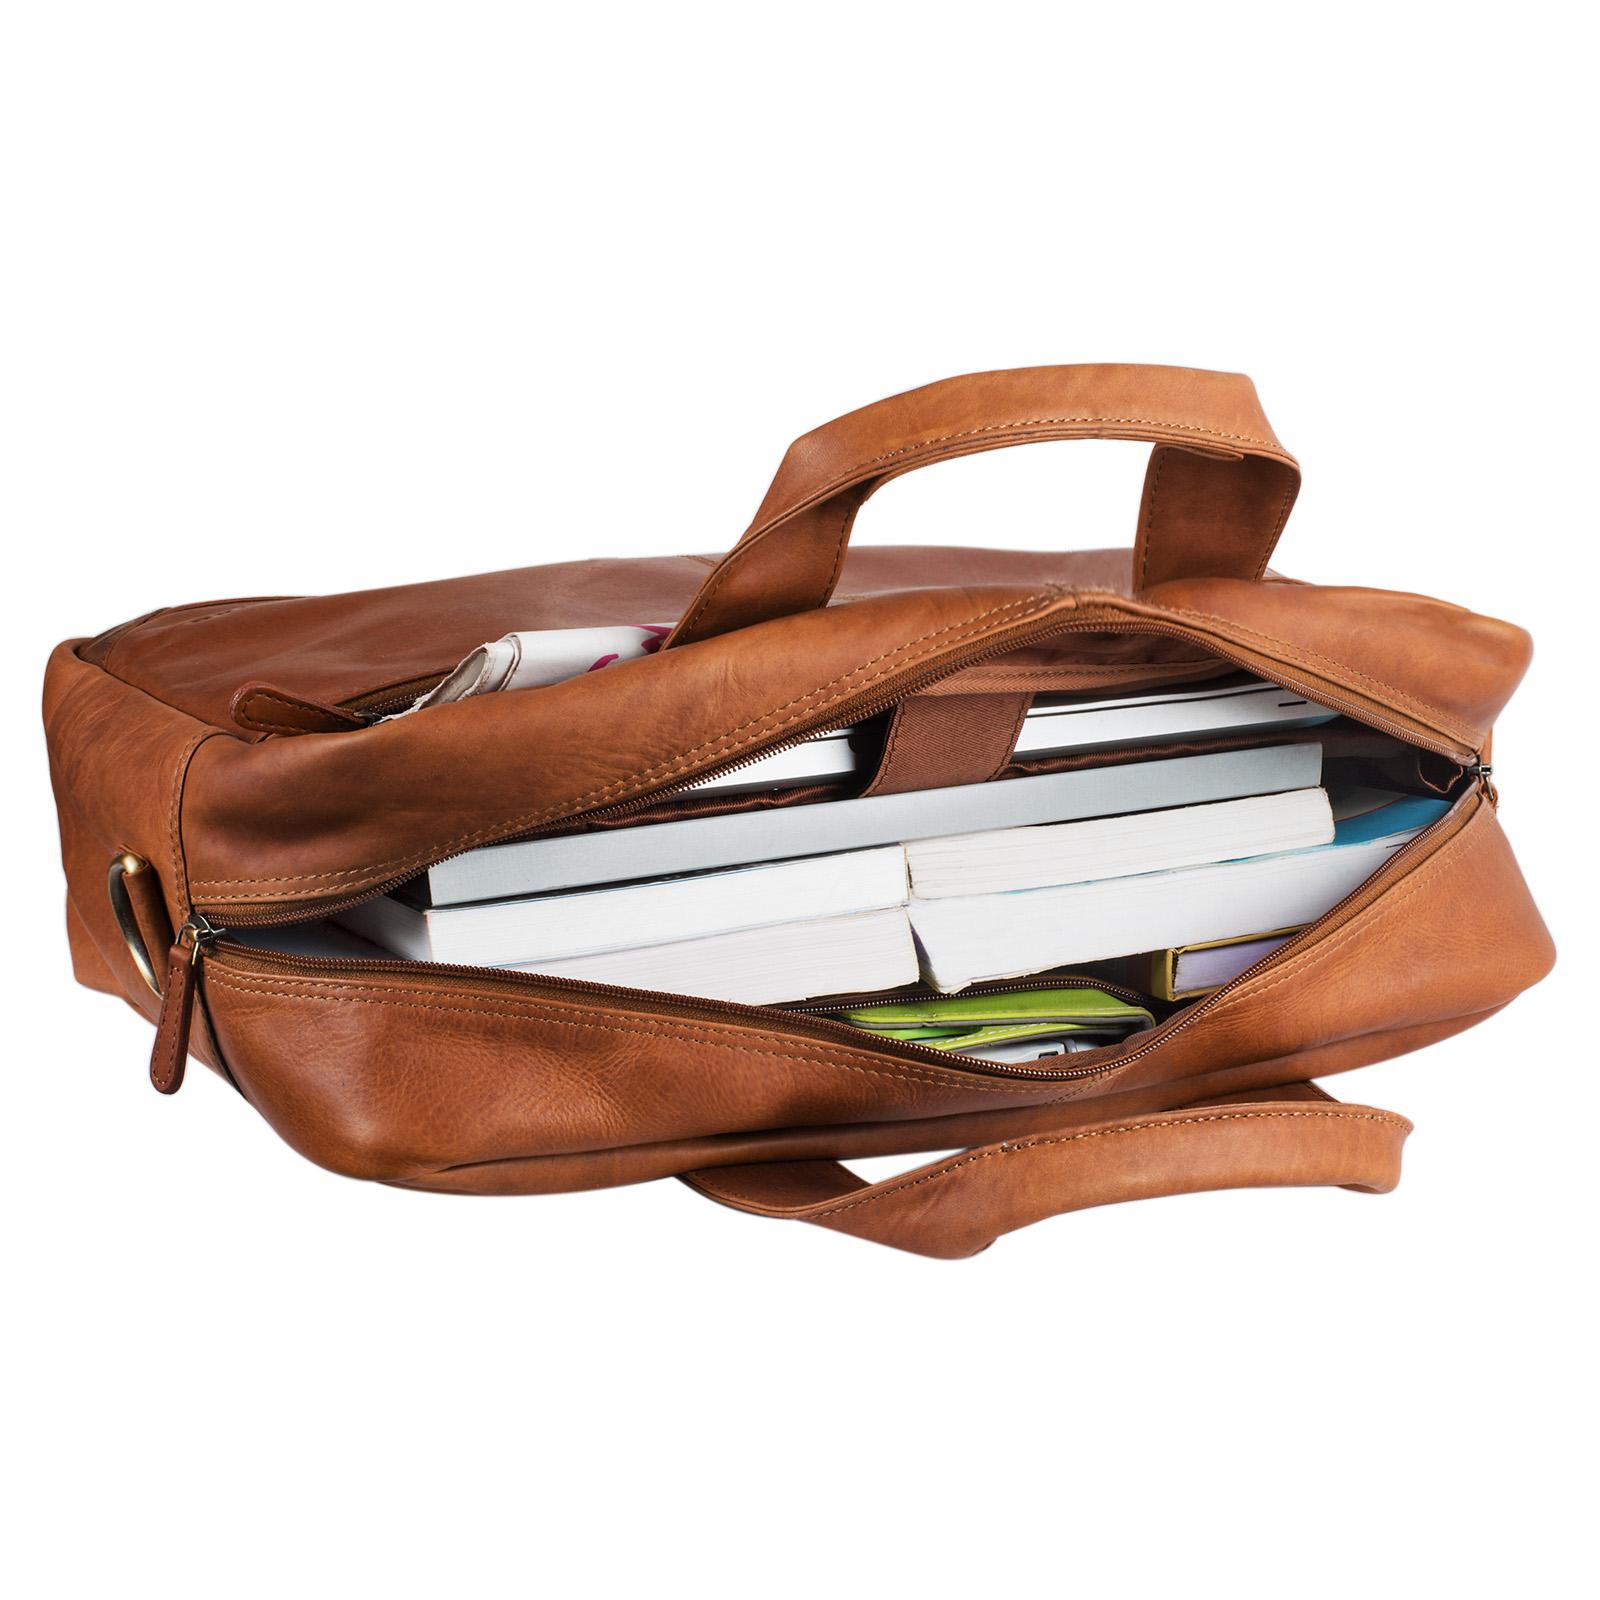 Ledertasche mit Laptopfach 15.6 Zoll Leder